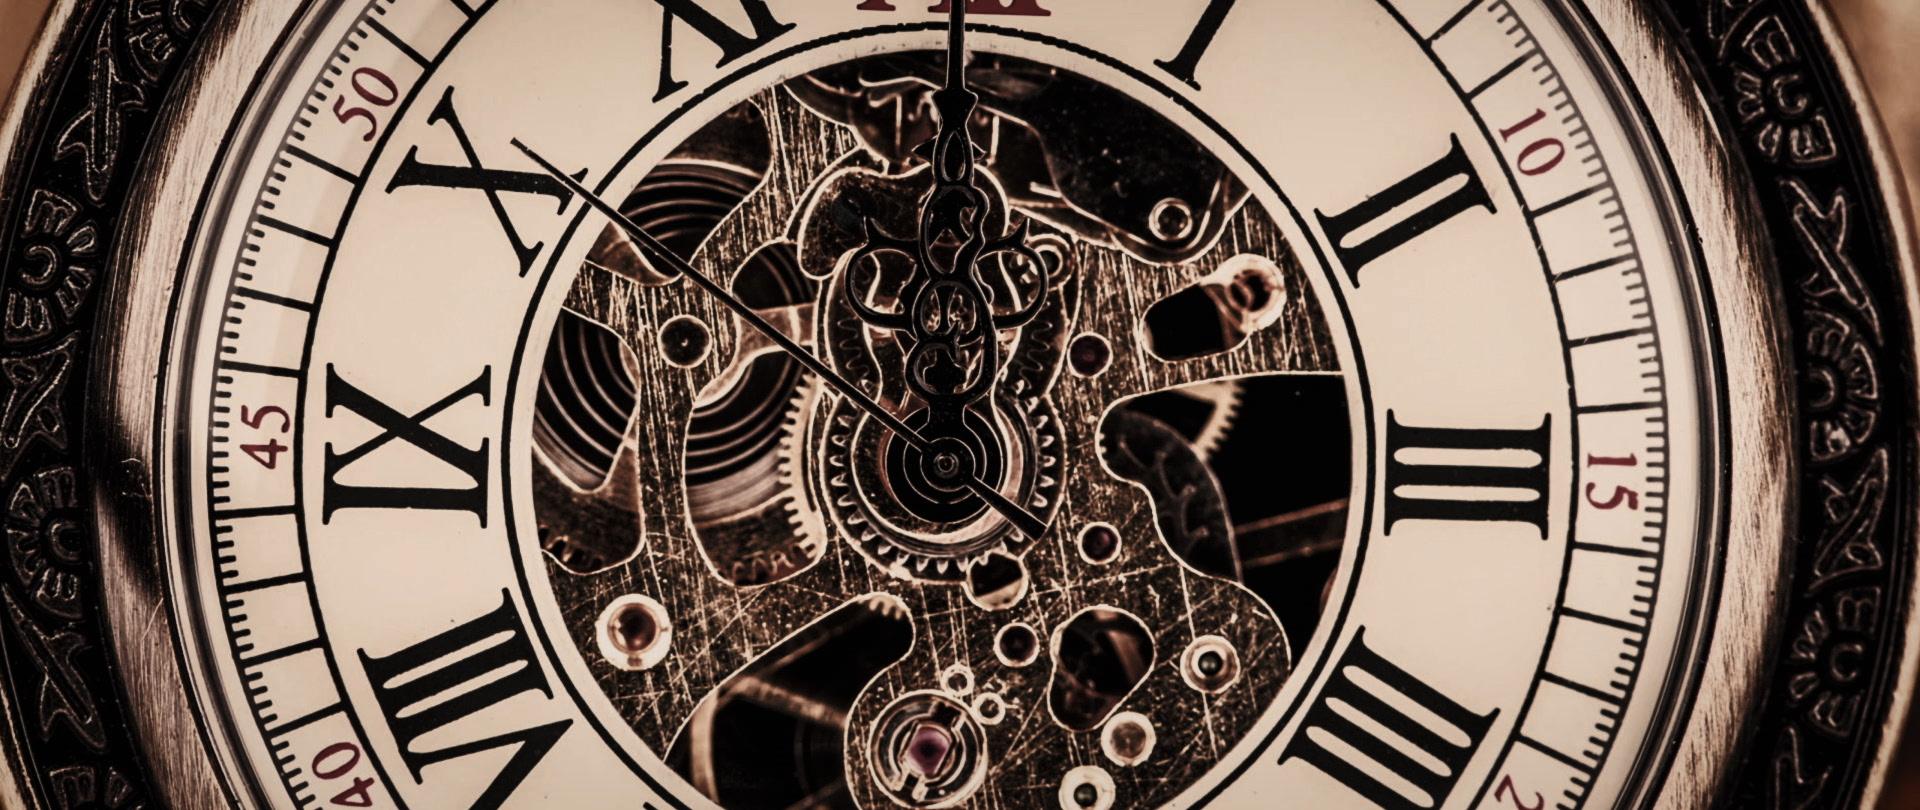 Clock+2.jpg